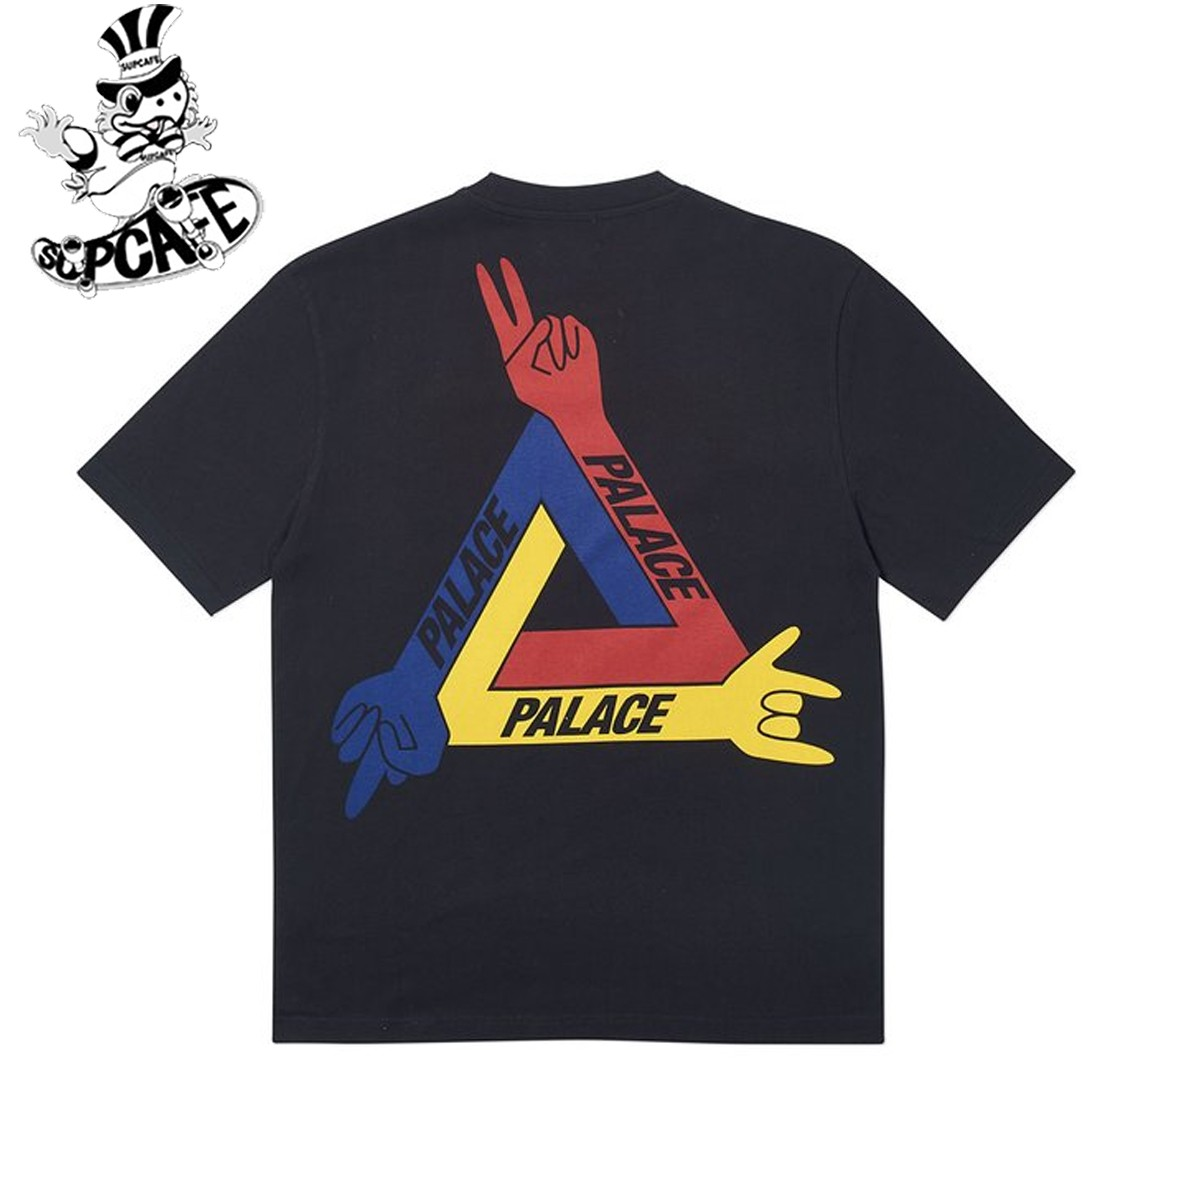 PALACE 現貨 19SS JCDC T-shirt 三角 手指 撲克 藝術家聯名 短袖